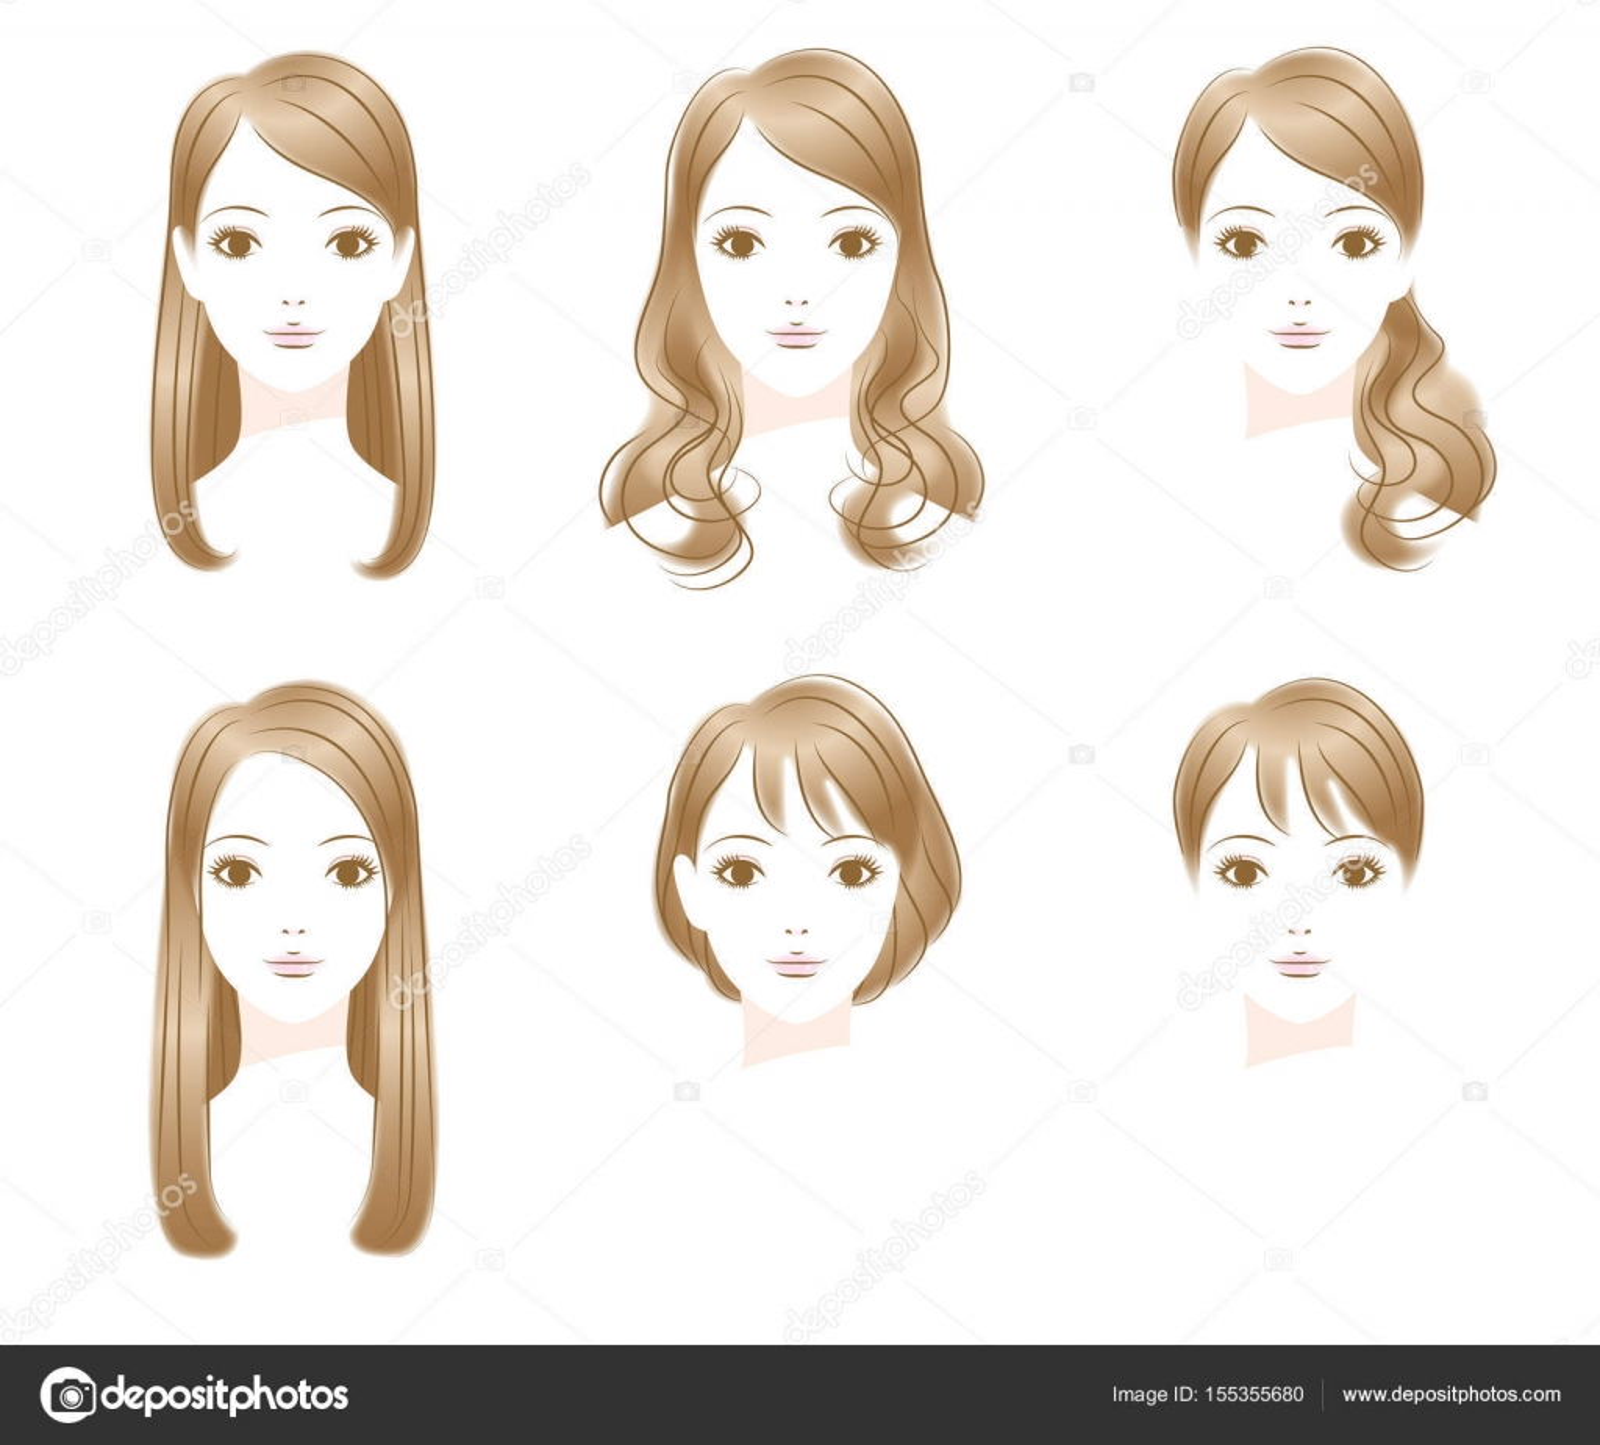 Frisur Lange Haare Kurze Haare Stockvektor Alphabetmn 155355680